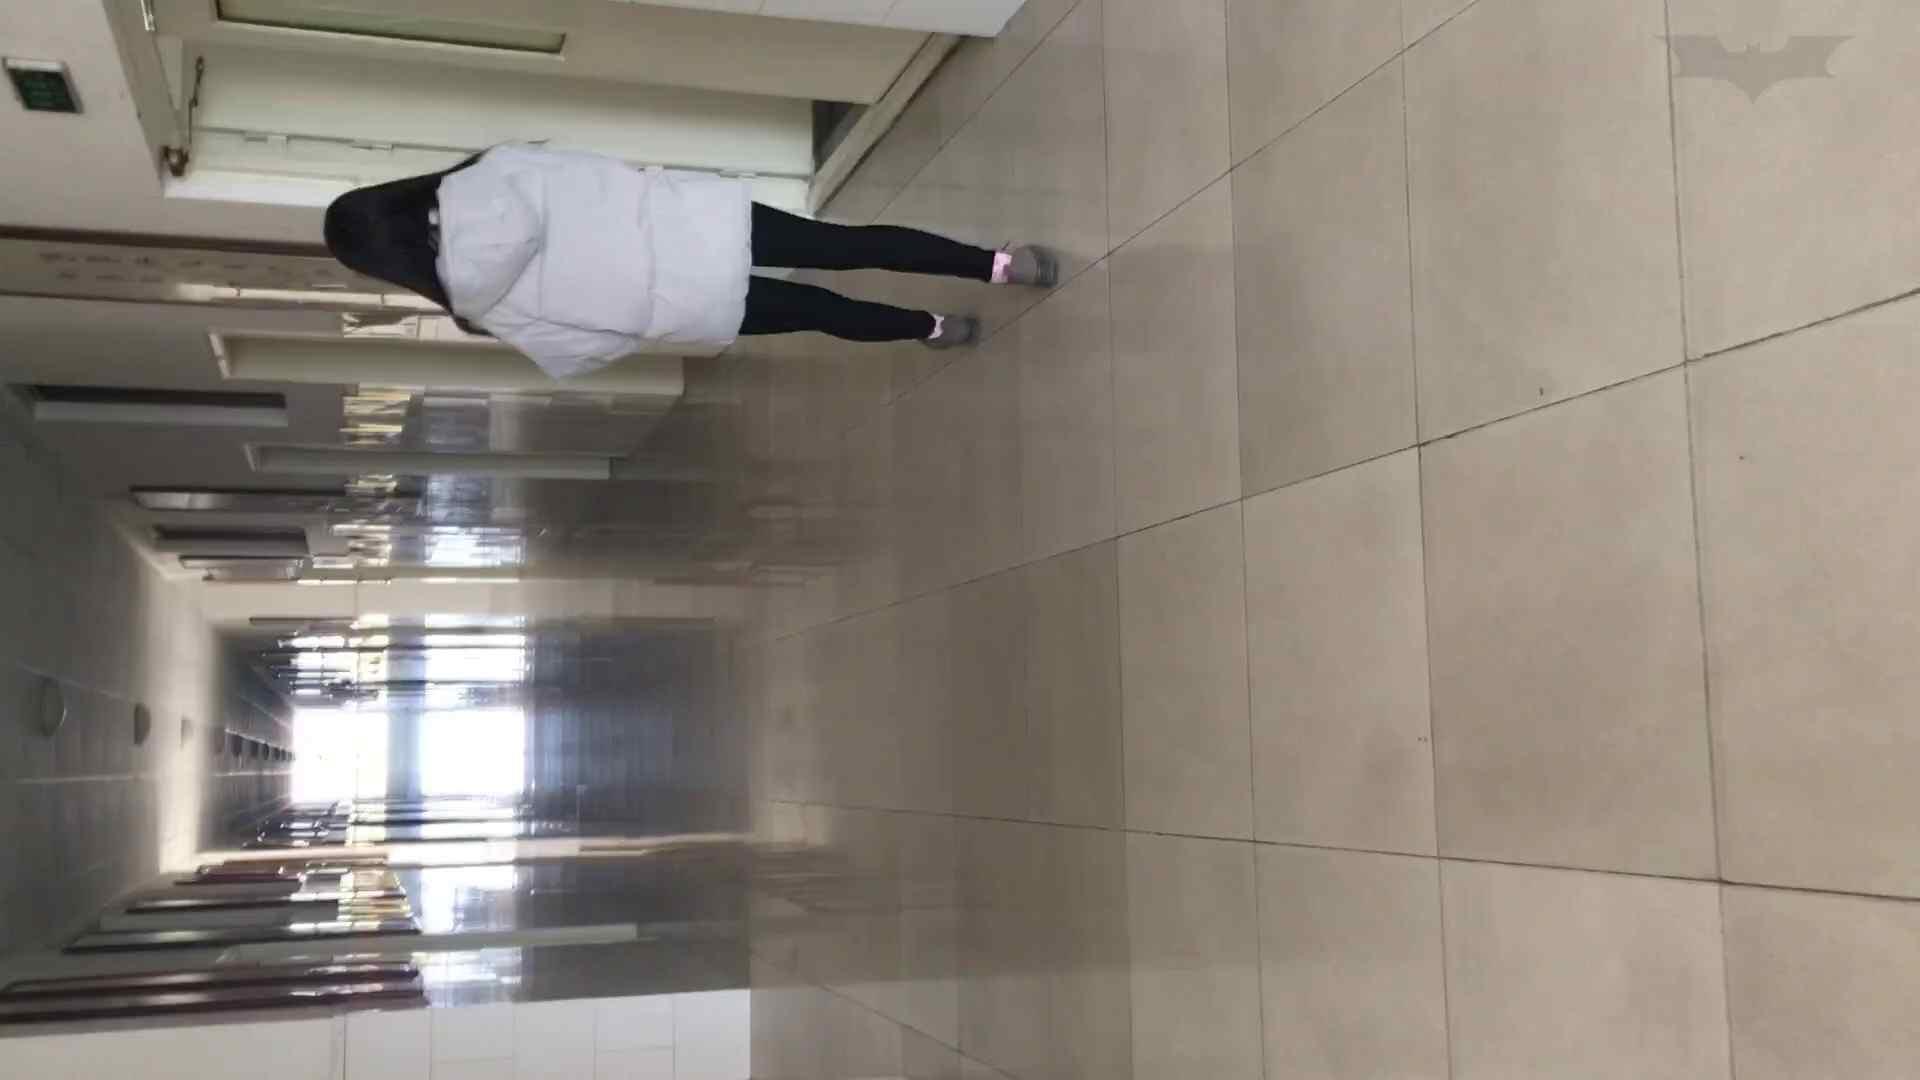 芸術大学ガチ潜入盗撮 JD盗撮 美女の洗面所の秘密 Vol.80 盛合せ  79PIX 23